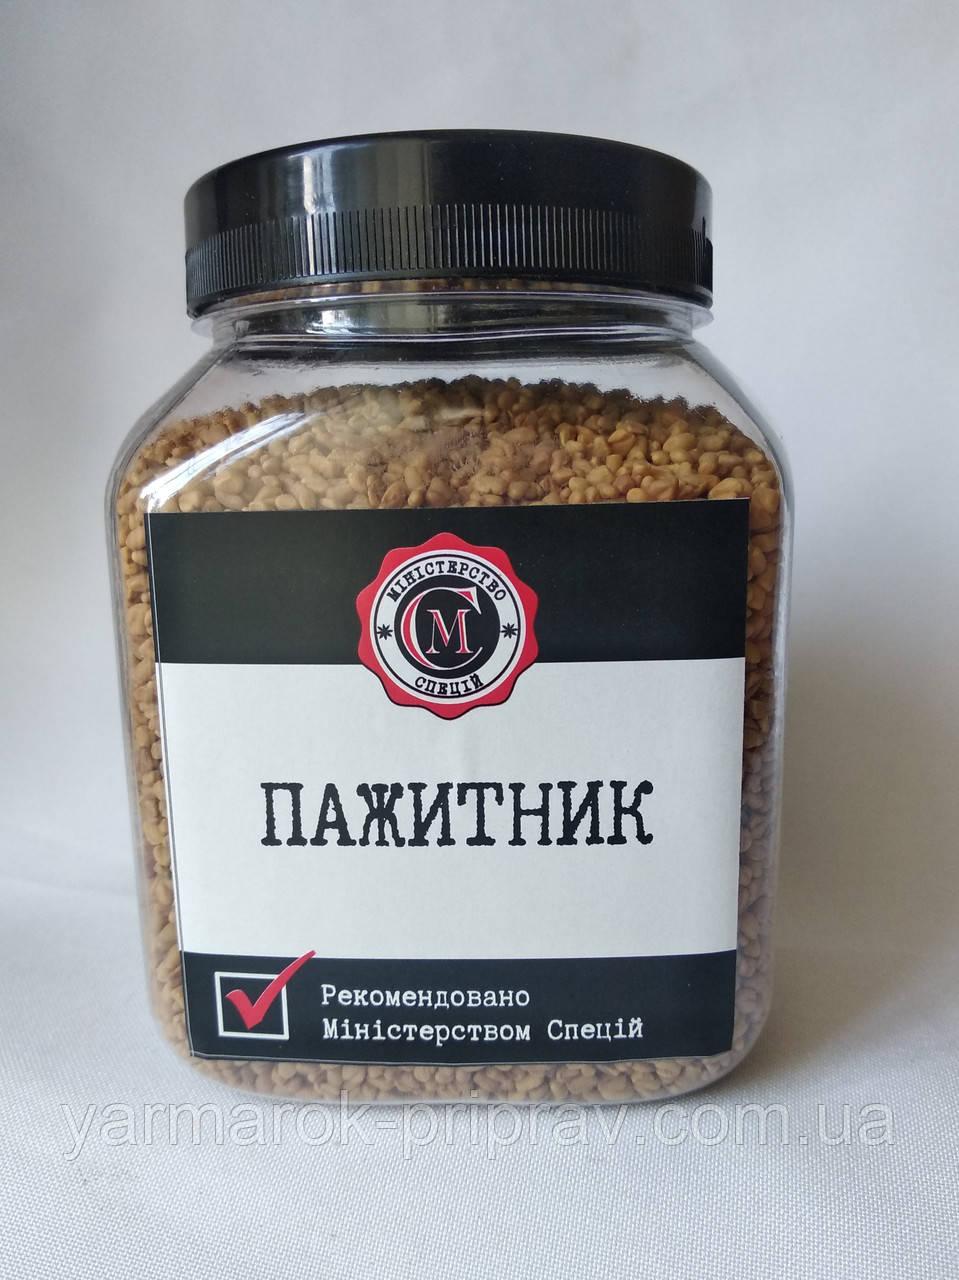 Пажитник (шамбала, фенугрек, чаман) семена, 350г